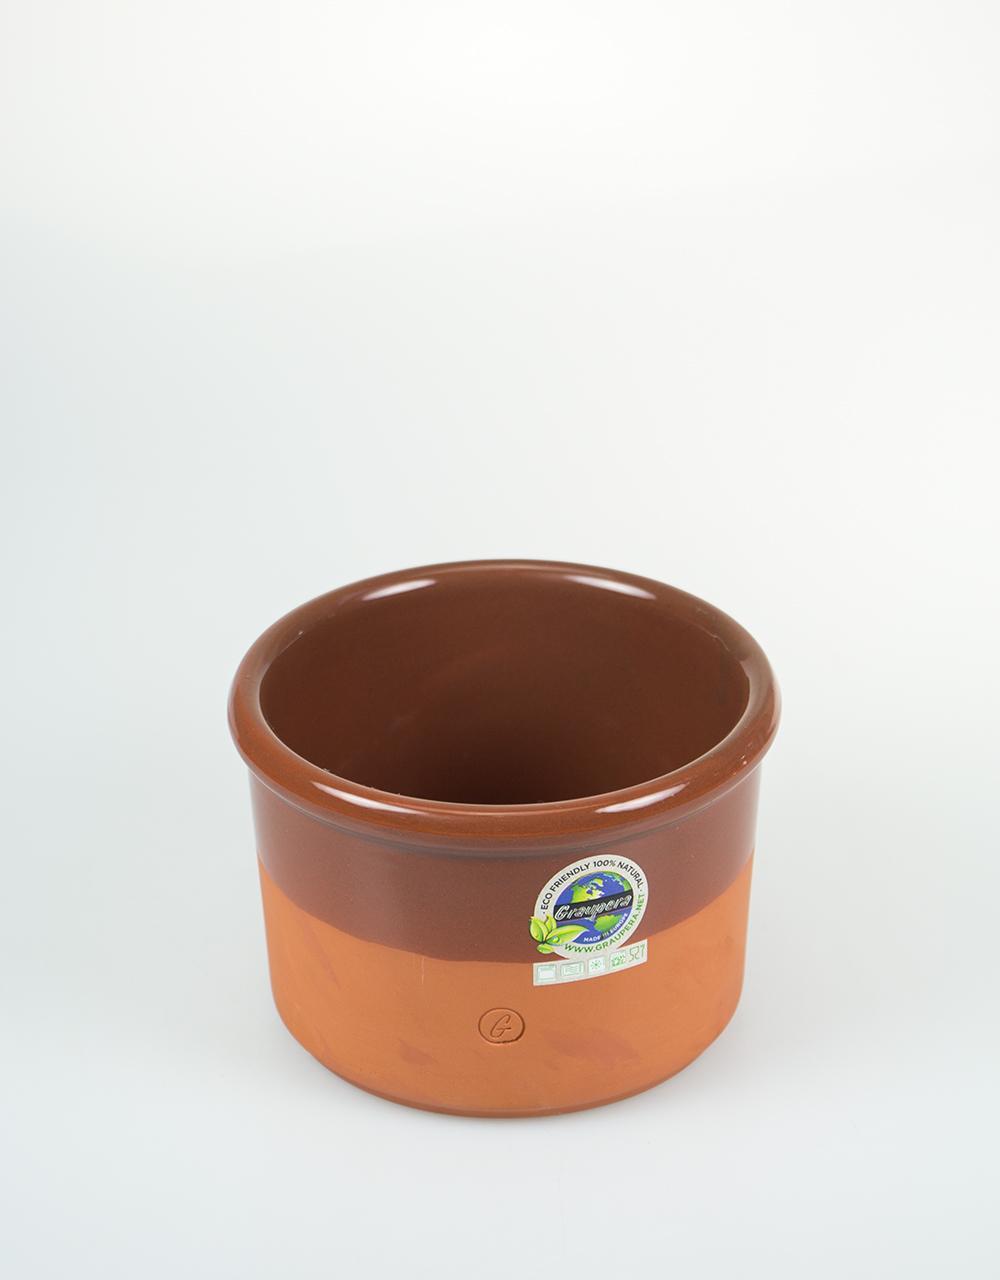 Graupera Custard Dish - Honey 11.5cm x 8cm